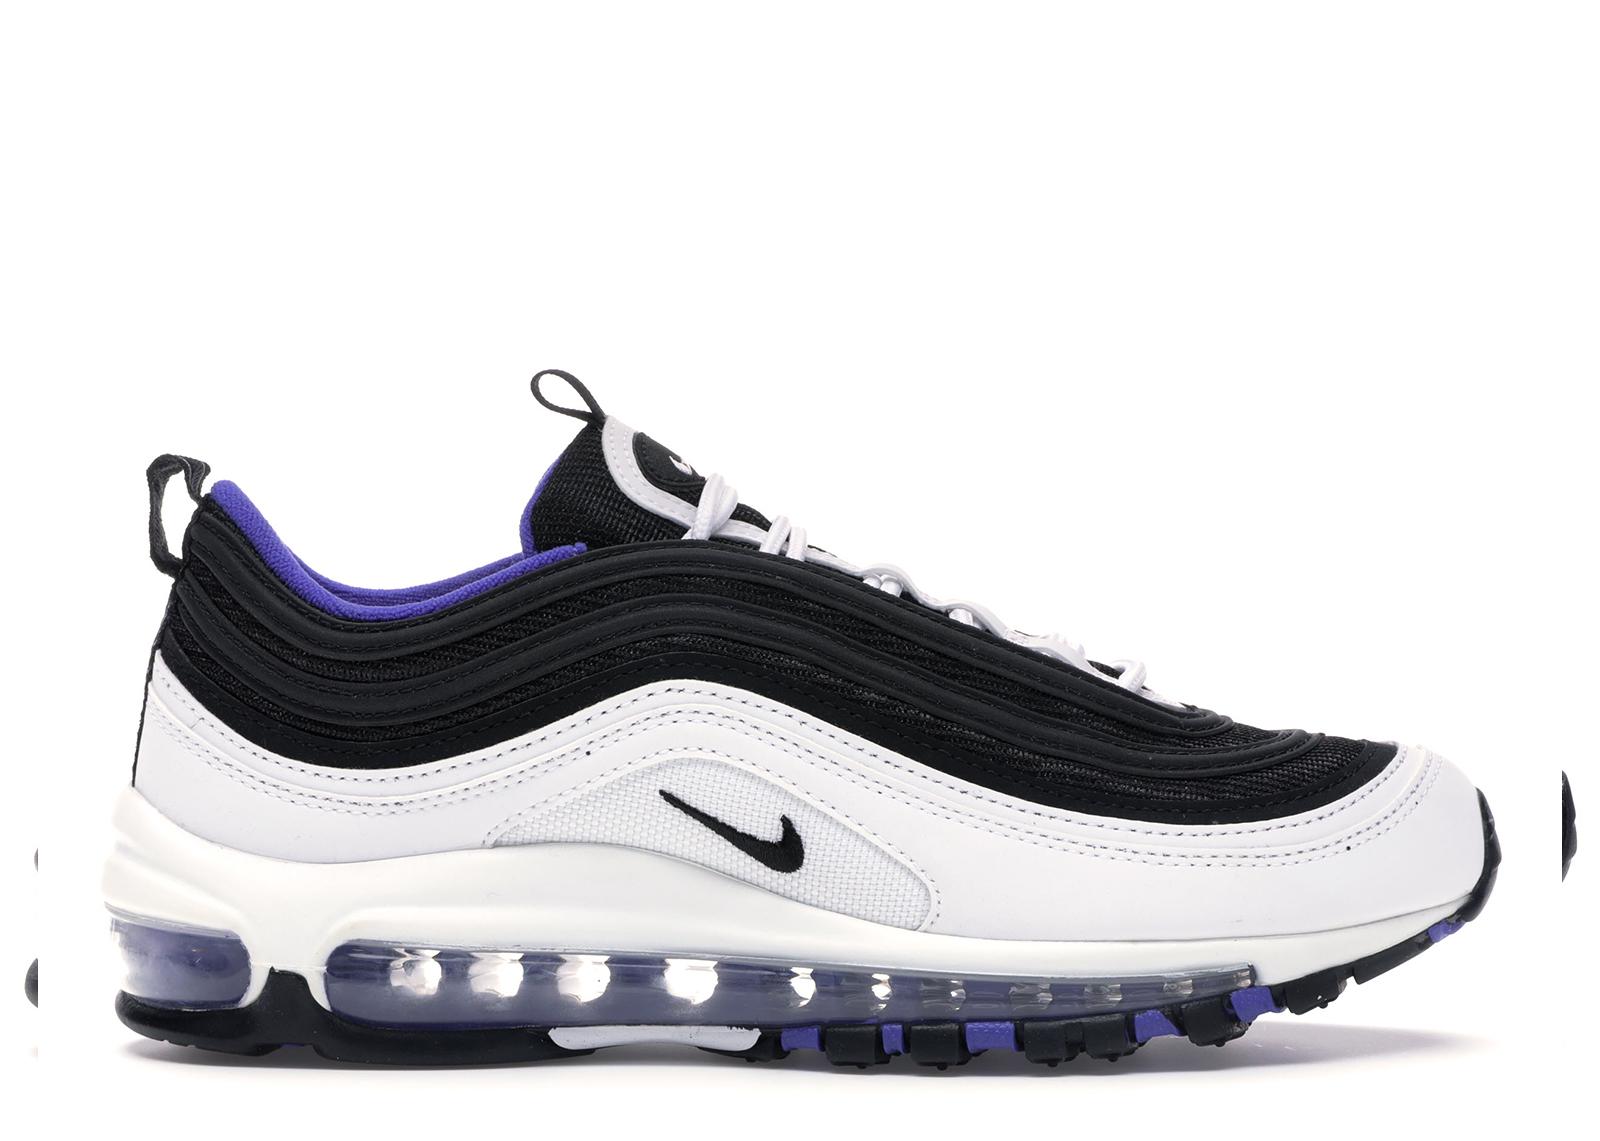 Nike Air Max 97 White Black Persian Violet (GS) - 921522-102